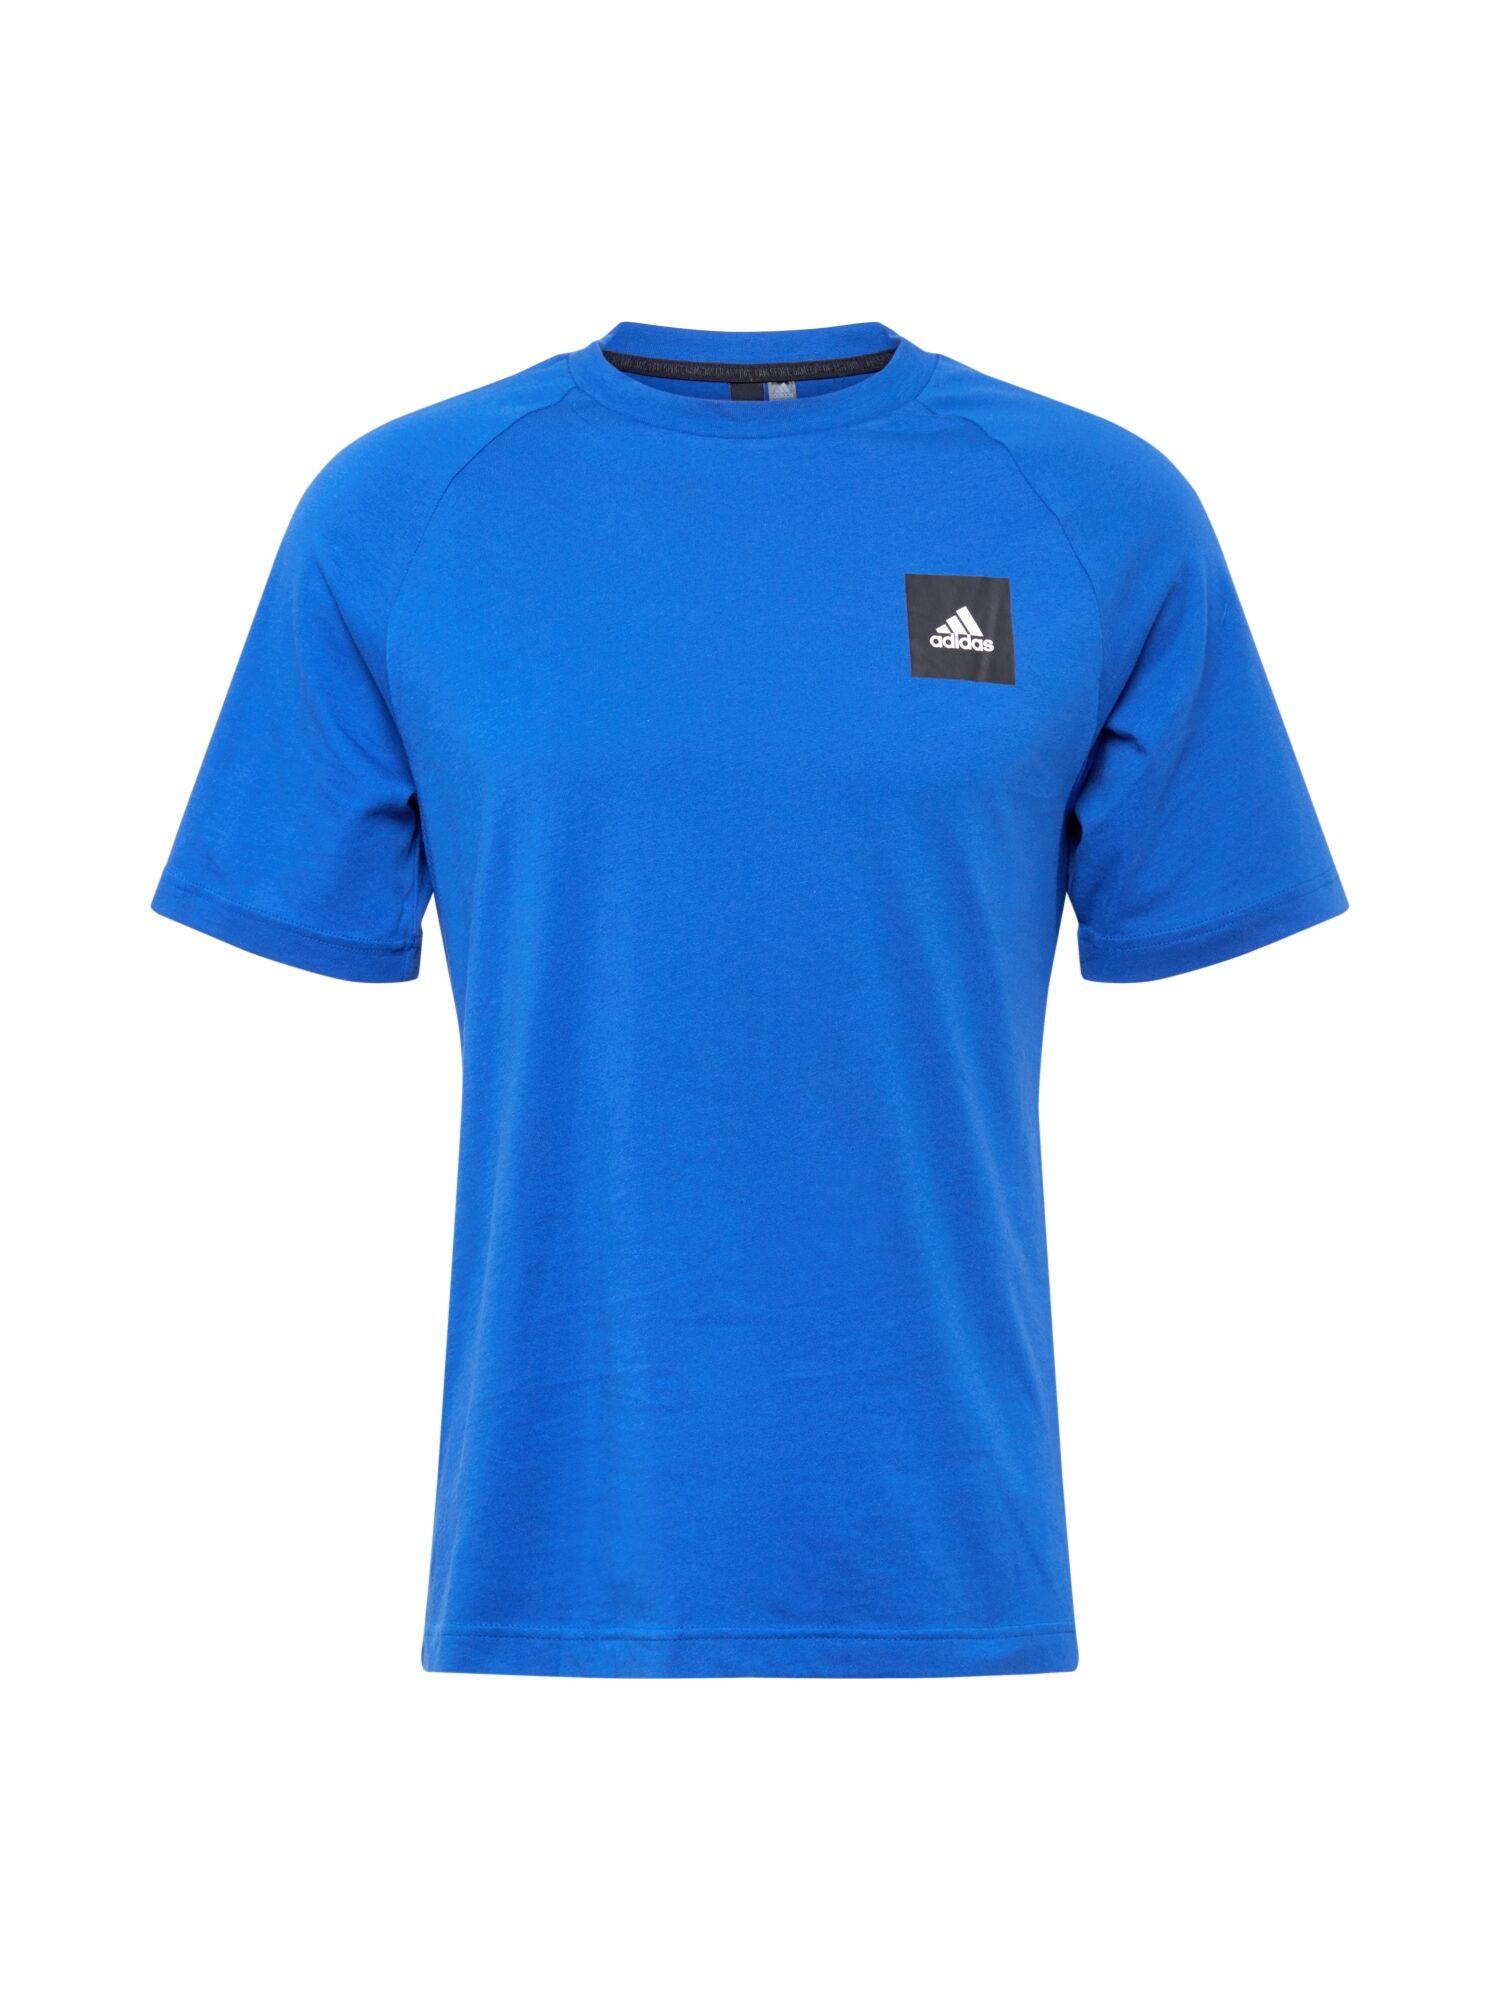 ADIDAS PERFORMANCE T-Shirt fonctionnel  - Bleu - Taille: S - male